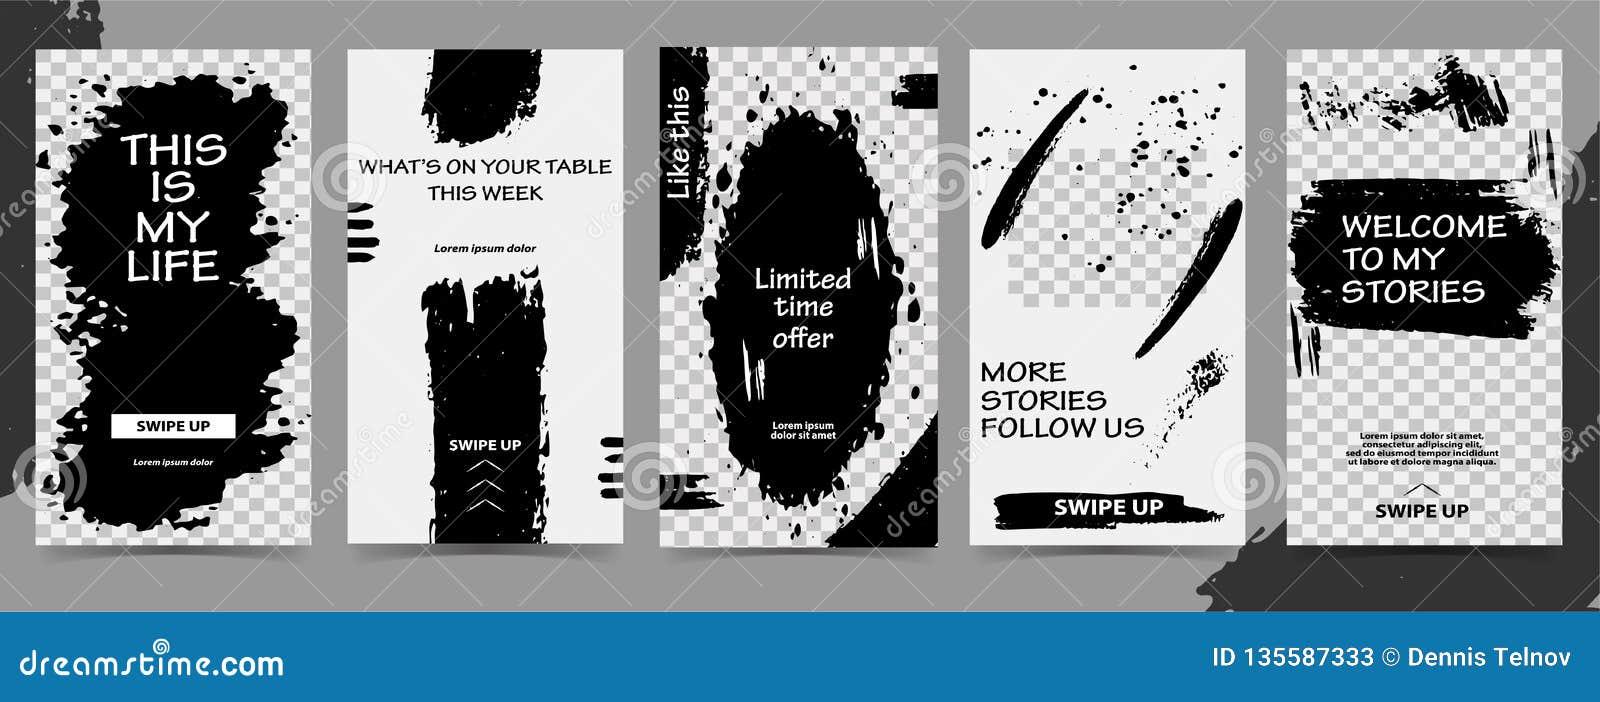 Trendy editable templates for instagram stories,black friday sale, gift, vector illustration. Design backgrounds for social media.